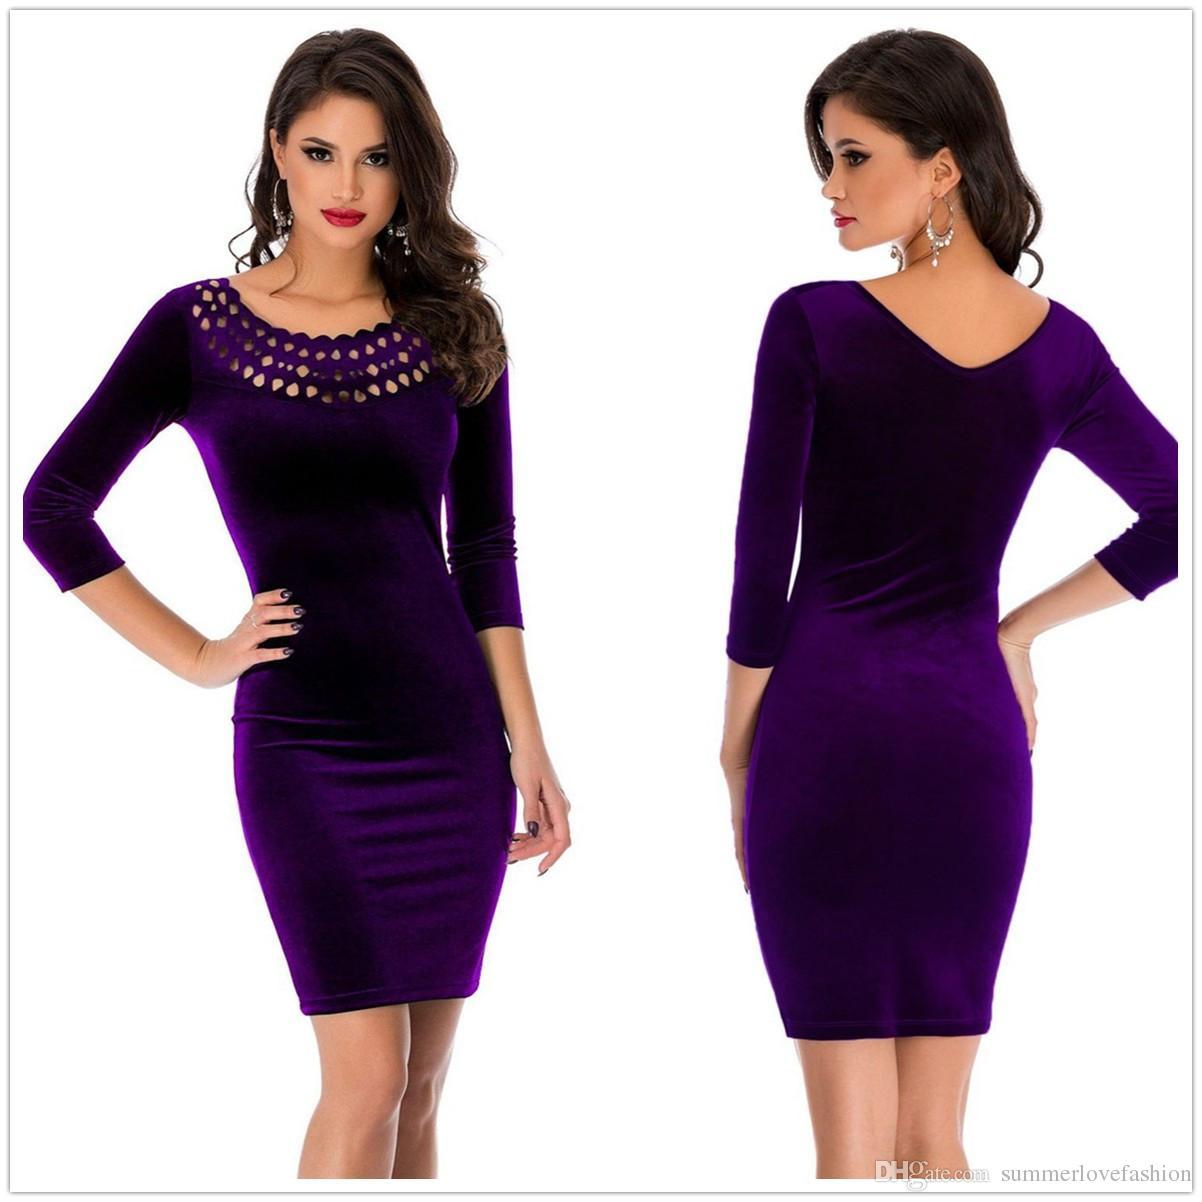 1a189e5f4b 2019 Black Purple Burgundy Navy Blue Round Neck Velvet Sheath Knee Length  Party Cocktail Dresses Hollow 3 4 Long Sleeves Short Evening Dress From ...